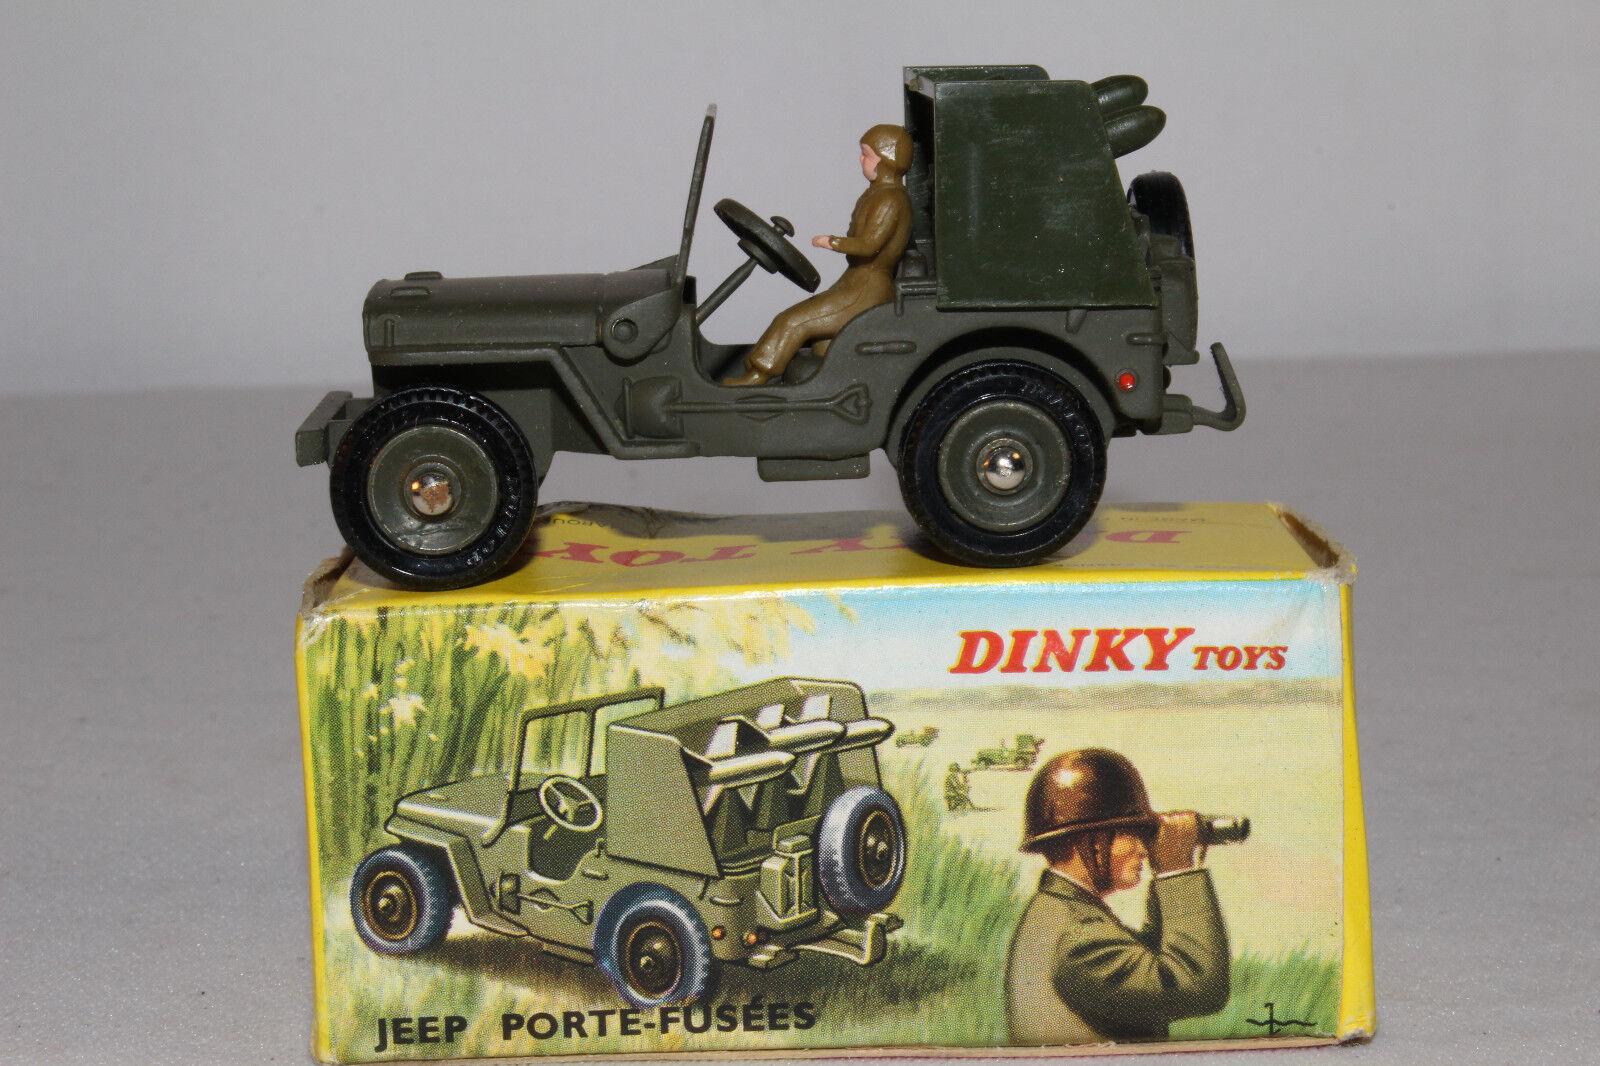 Década de 1960 francés Dinky  828 cohete portador Jeep, buen lote de  8, Con Caja Original